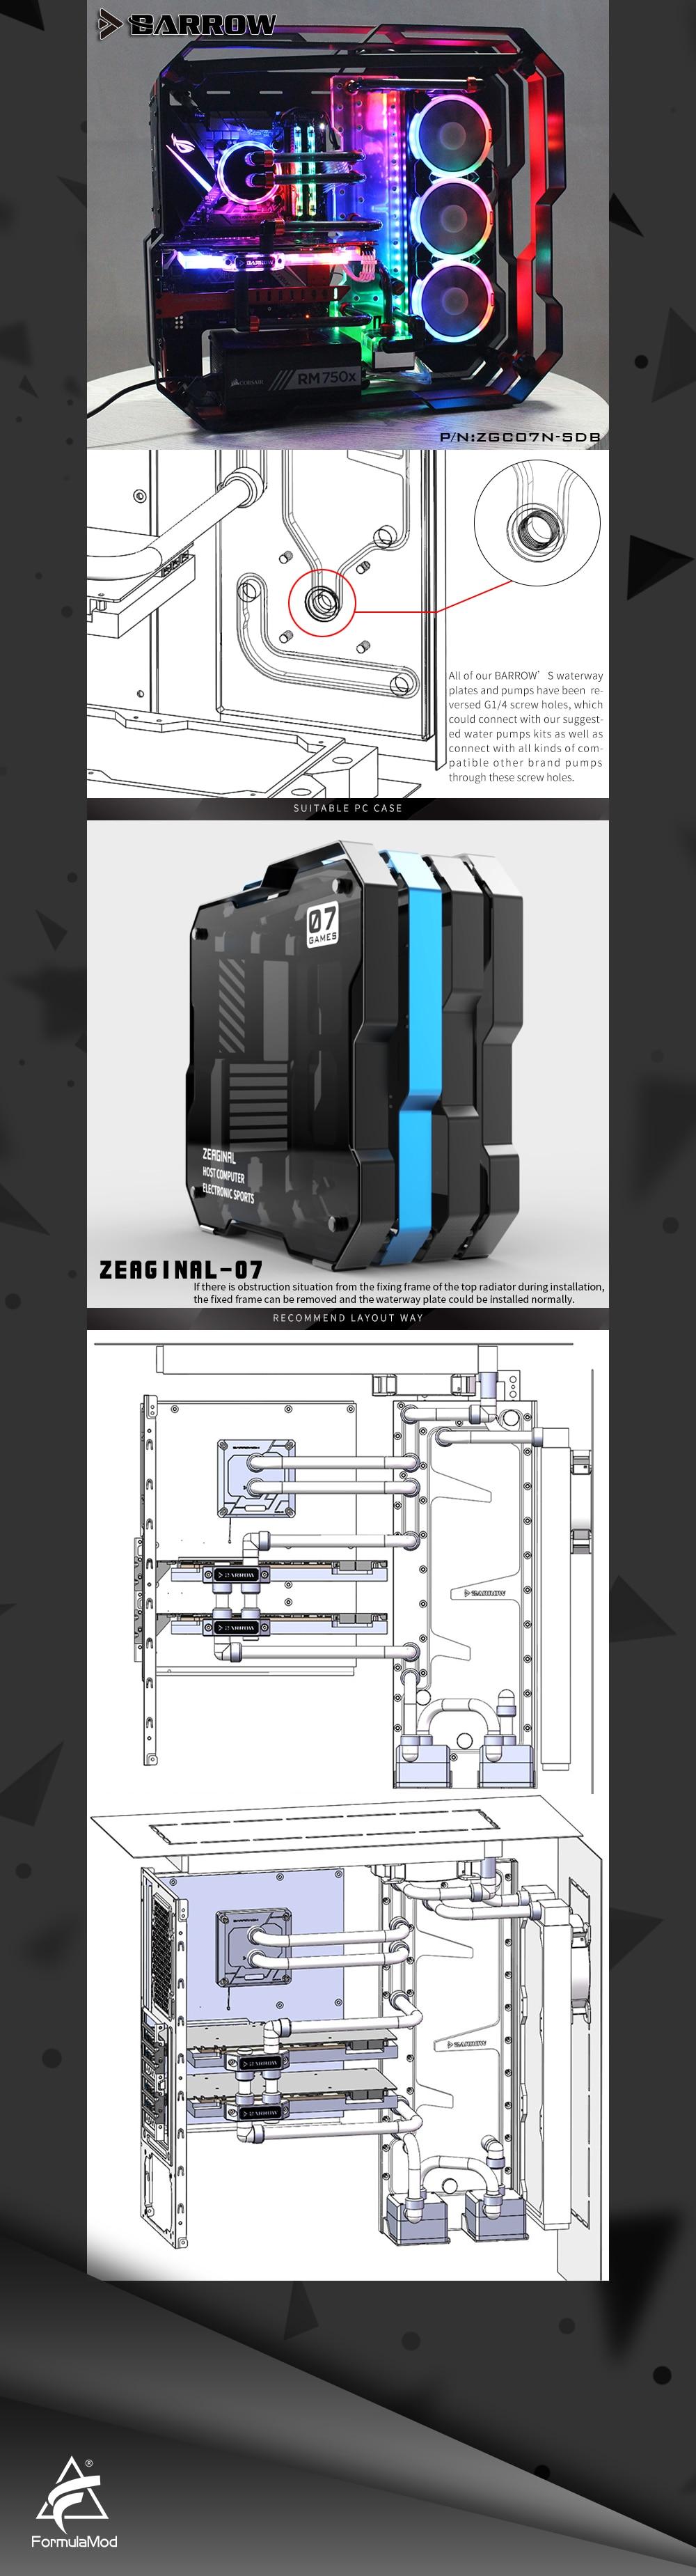 Barrow ZGC07N-SDB, Waterway Boards For Zeaginal ZG-07 Case, For Intel CPU Water Block & Single/Double GPU Building